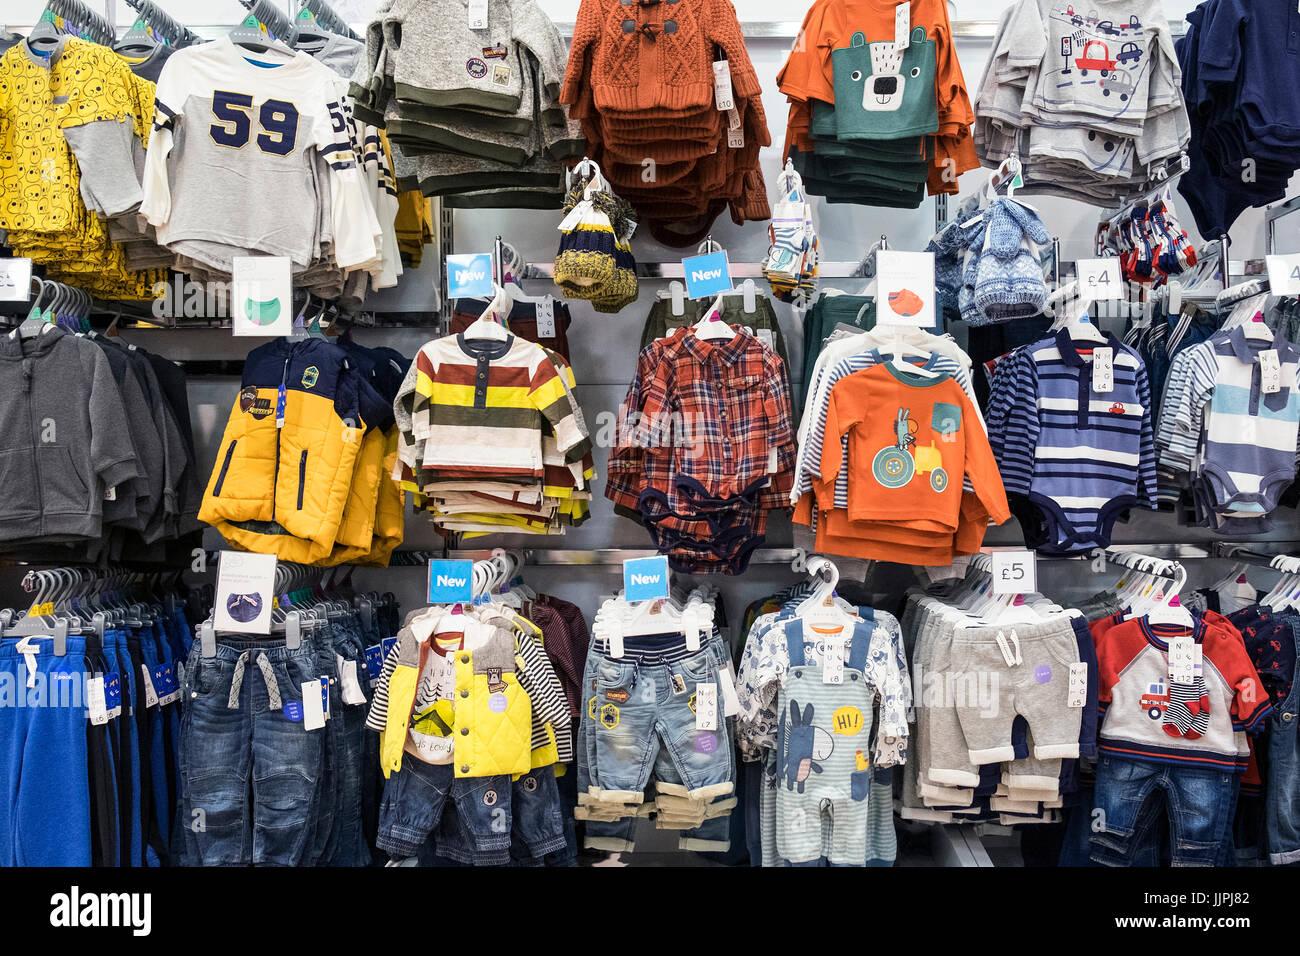 children 39 s clothes store stock photos children 39 s clothes. Black Bedroom Furniture Sets. Home Design Ideas